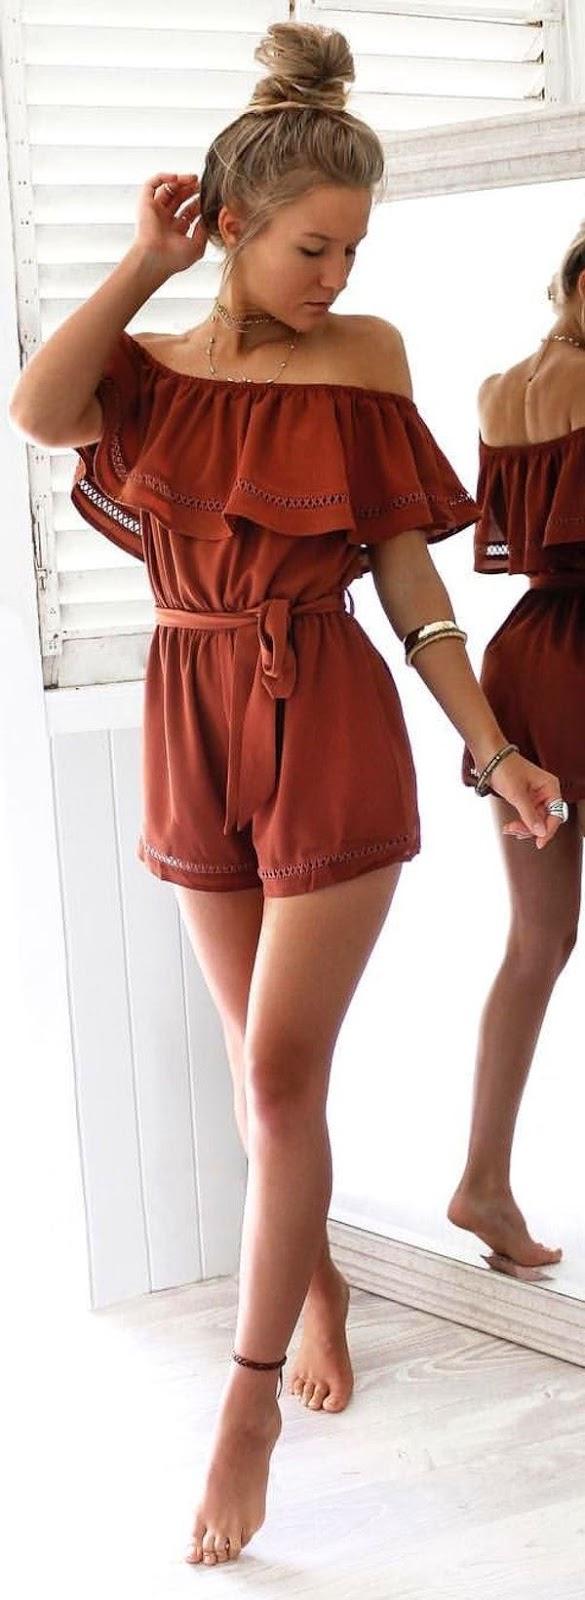 cool summer outfit idea / off-shoulder palysuit